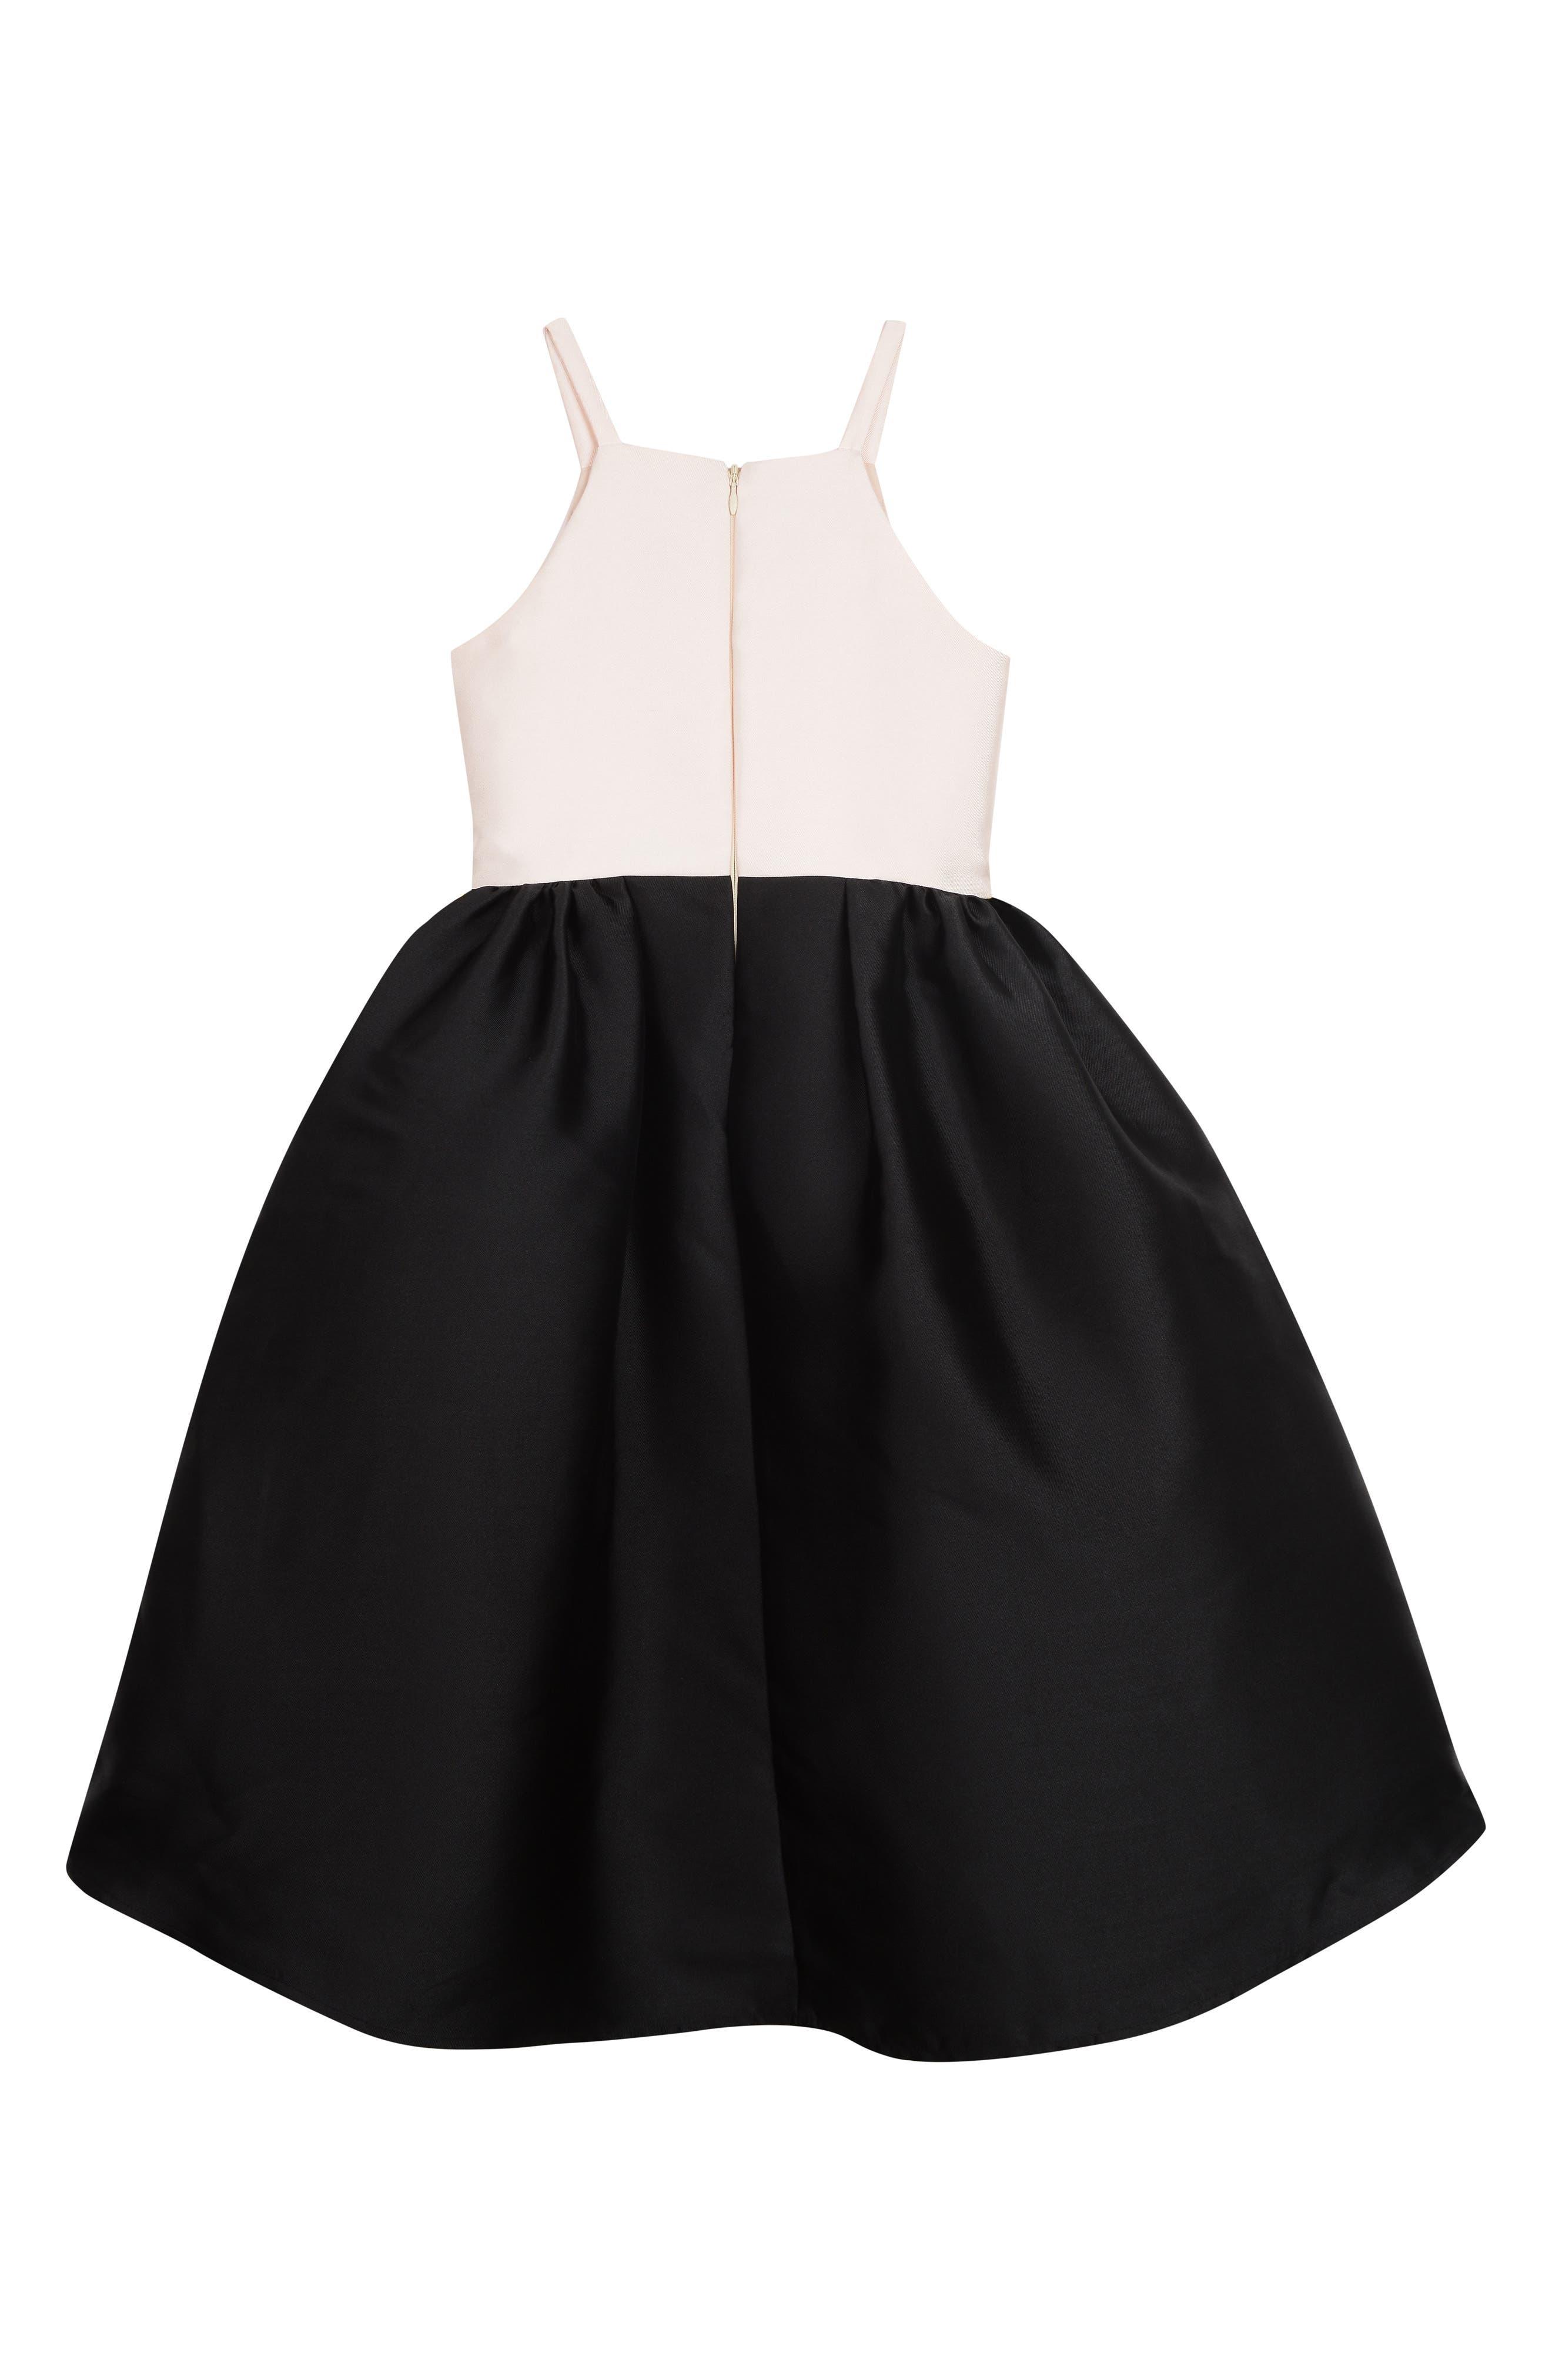 BADGLEY MISCHKA COLLECTION, Badgley Mischka Colorblock Sleeveless Dress, Alternate thumbnail 2, color, BLACK/ IVORY